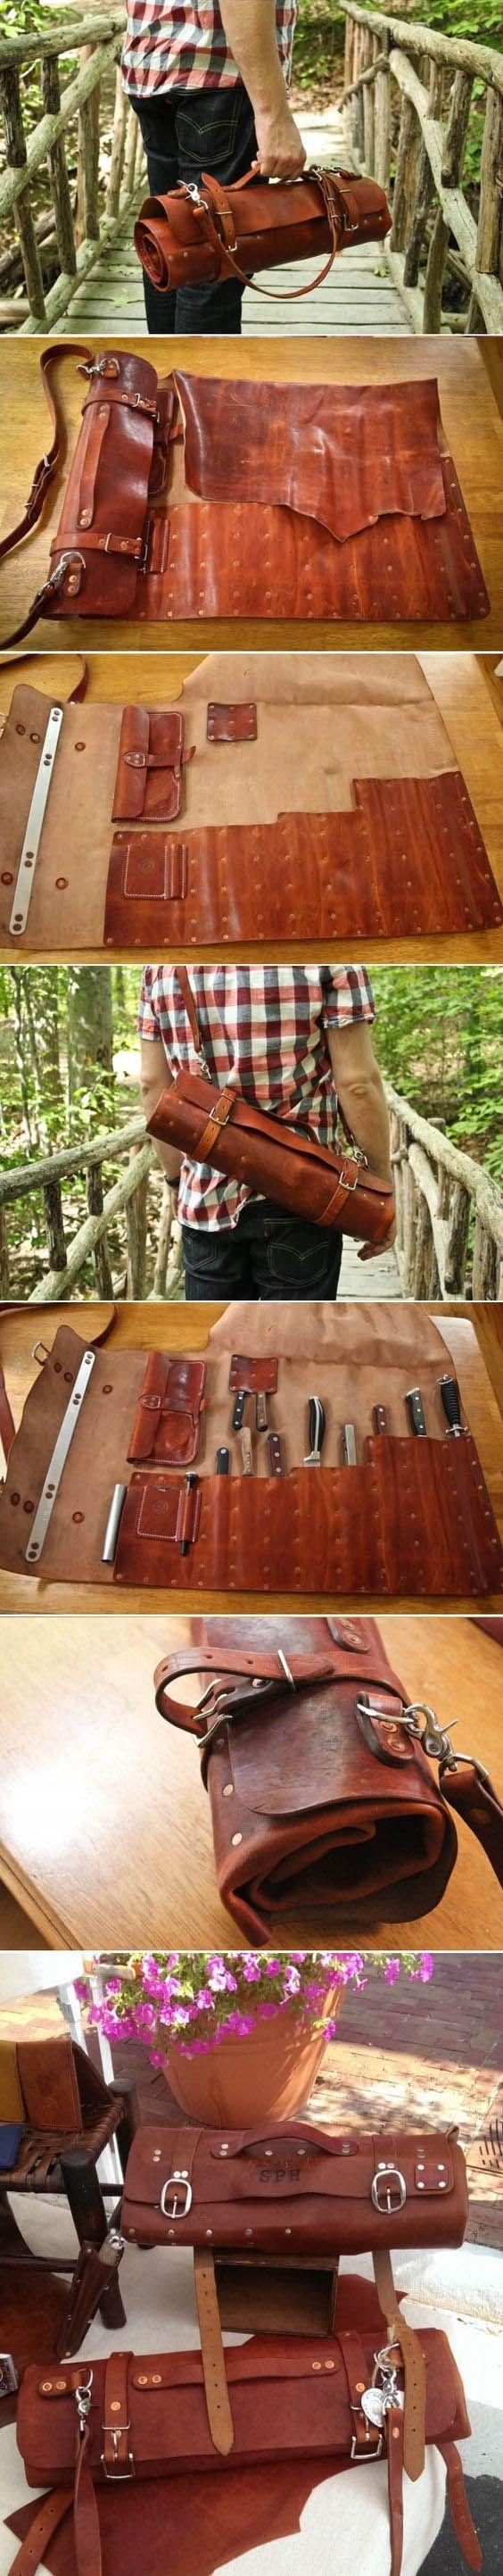 best 25 leather holster ideas on pinterest gun holster holsters and knife sheath. Black Bedroom Furniture Sets. Home Design Ideas